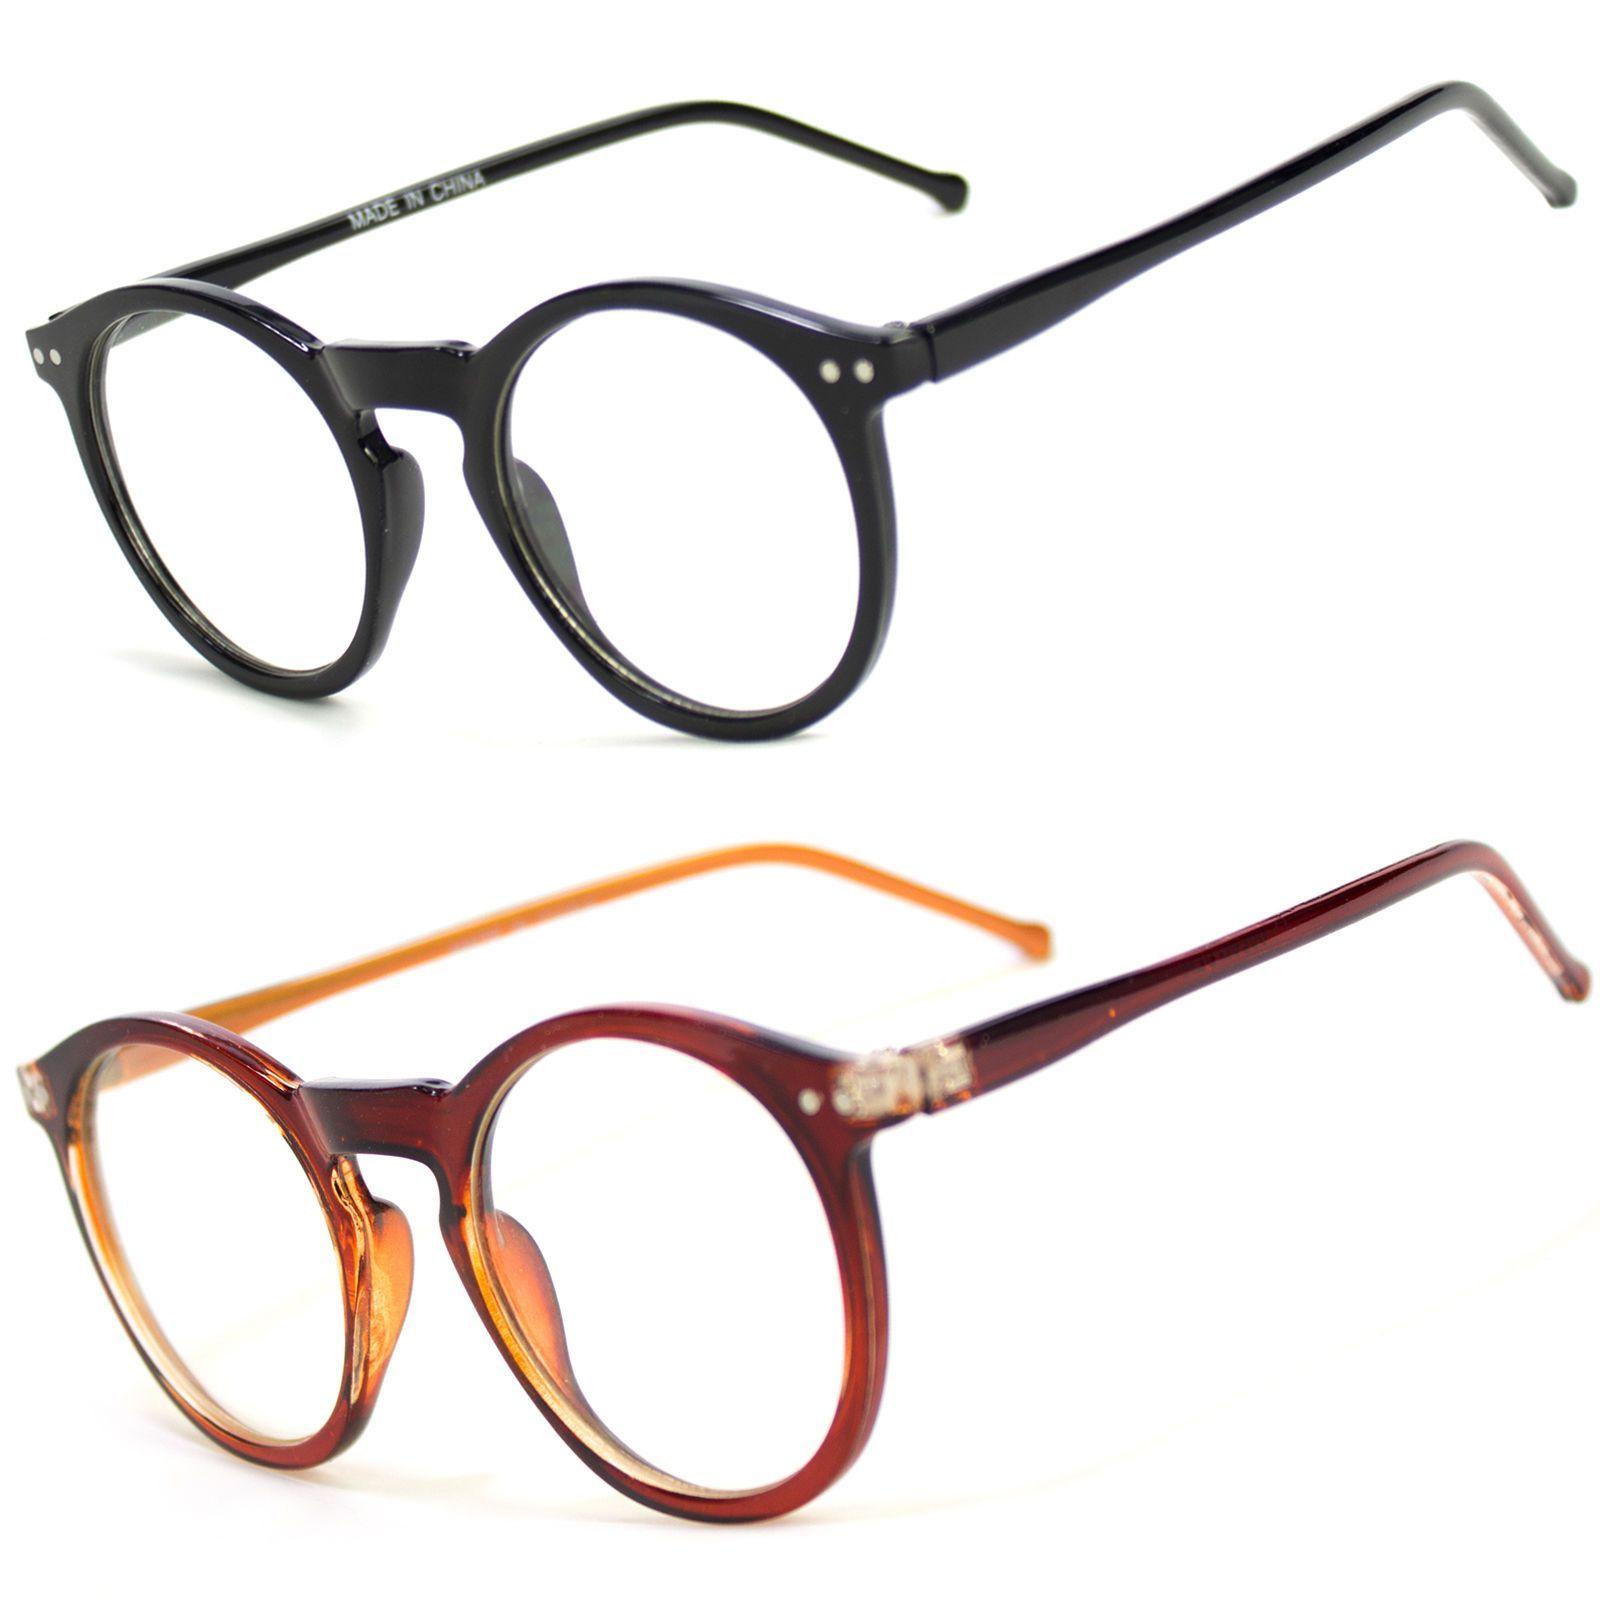 ab7cae70a3 Men Women Unisex Nerd Hipster Glasses Clear Lens Eyewear Retro Oval Round  Frame